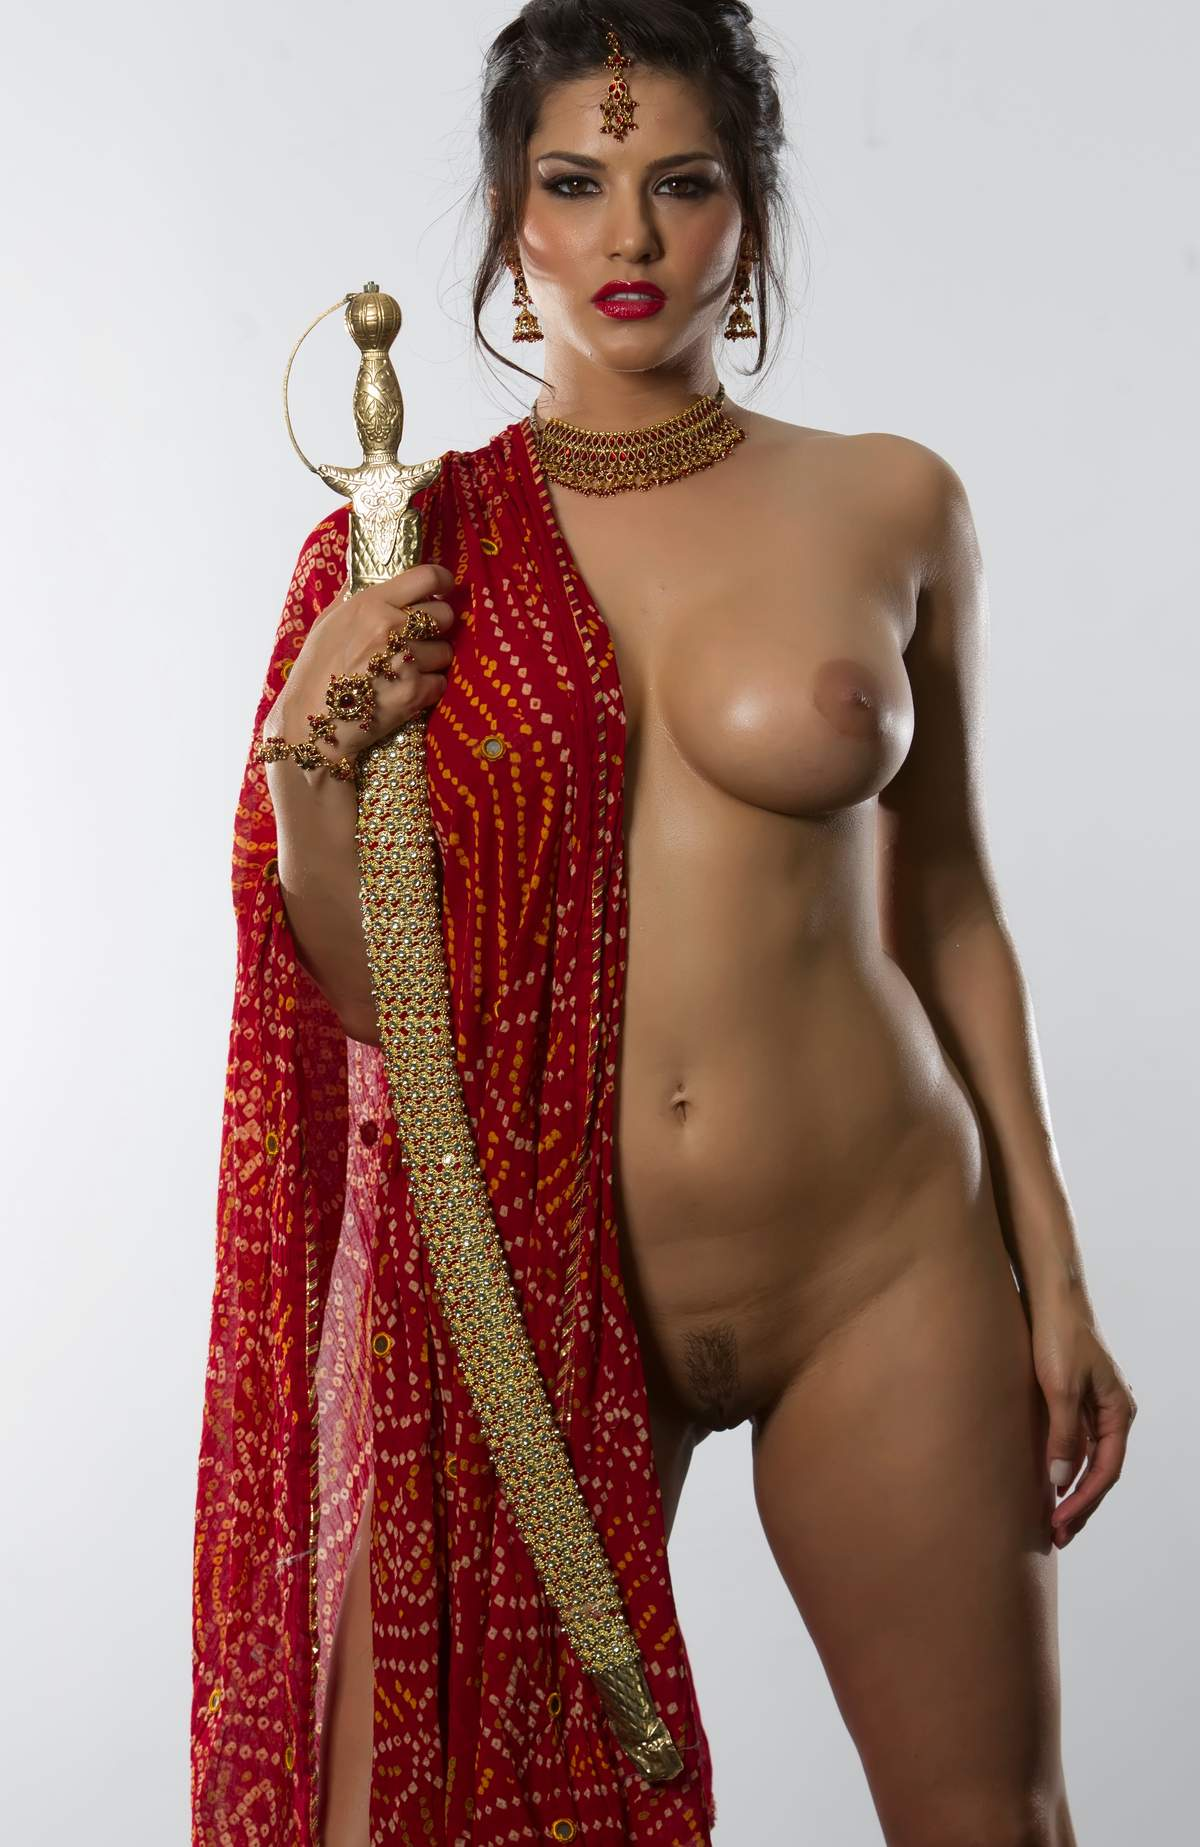 eroticheskie-fotografii-indianok-ebut-negri